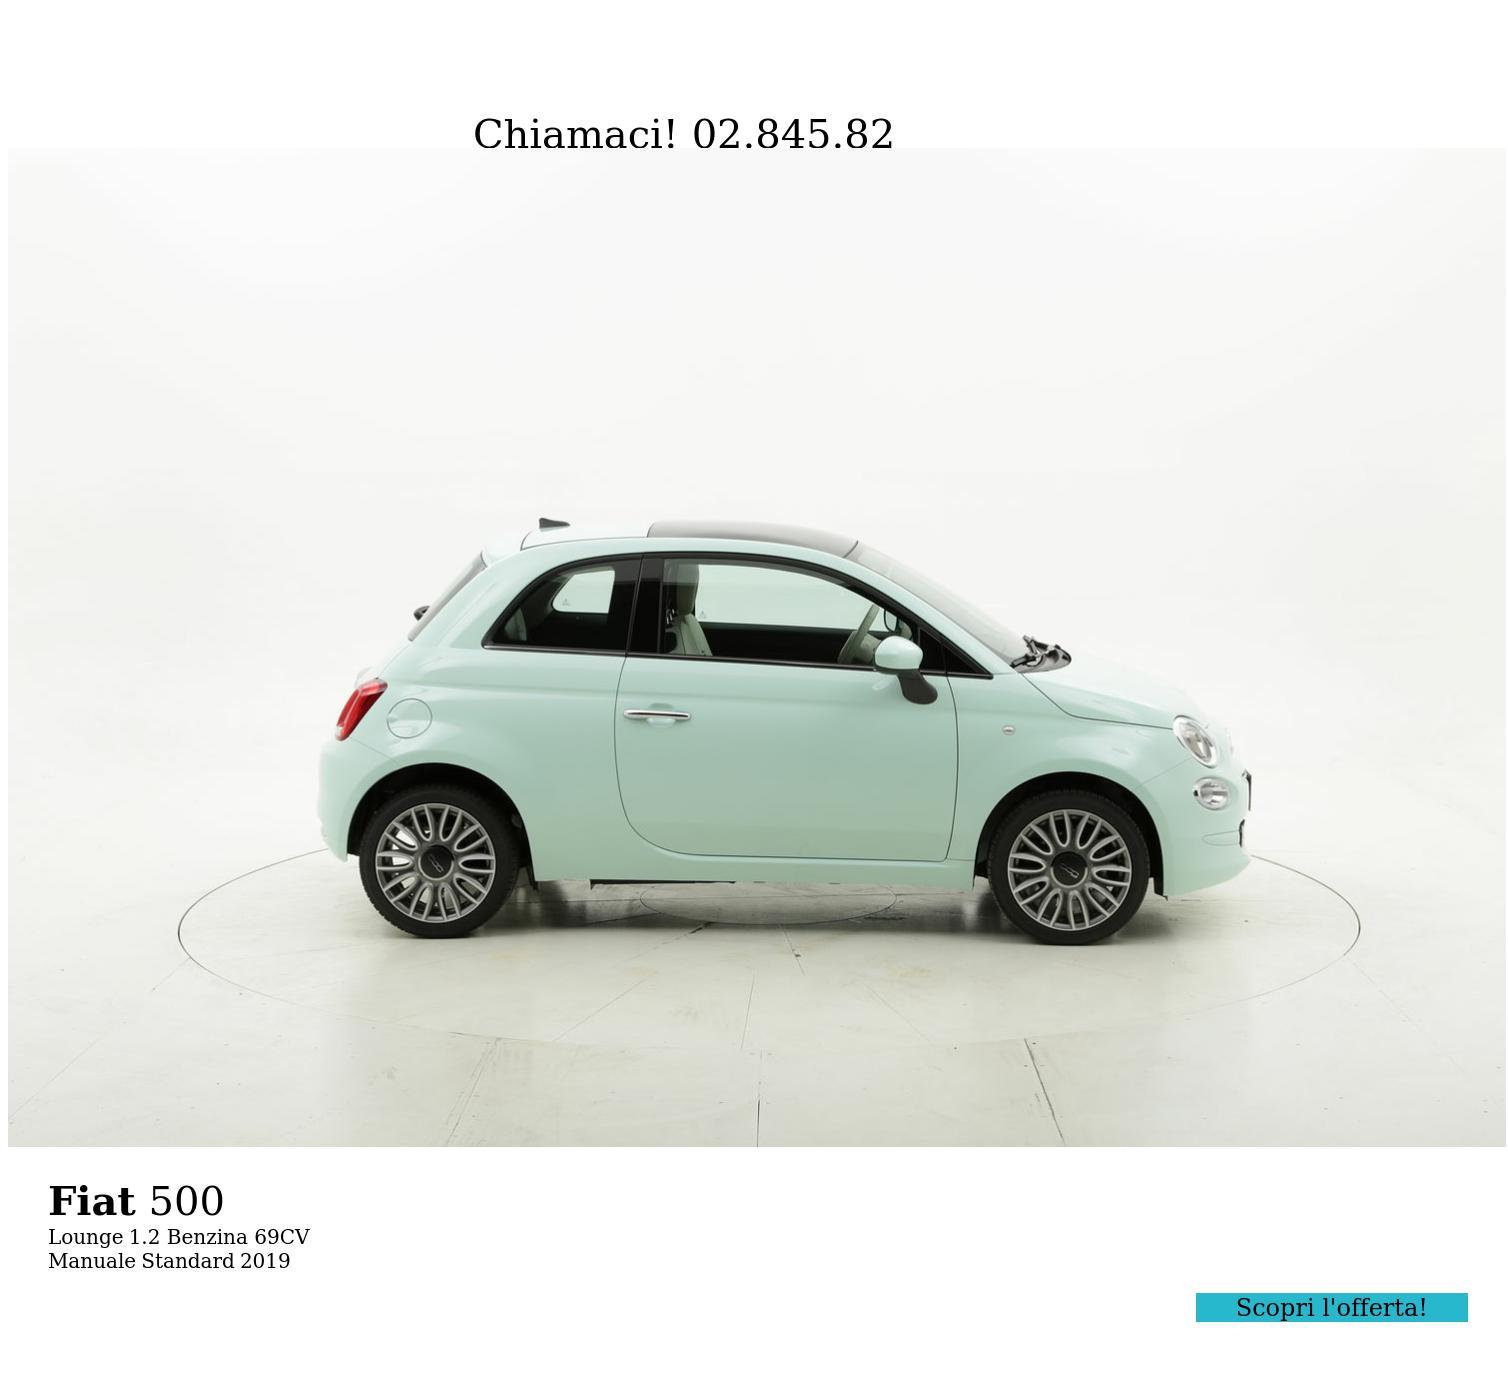 Fiat 500 Lounge km 0 benzina verde chiara | brumbrum